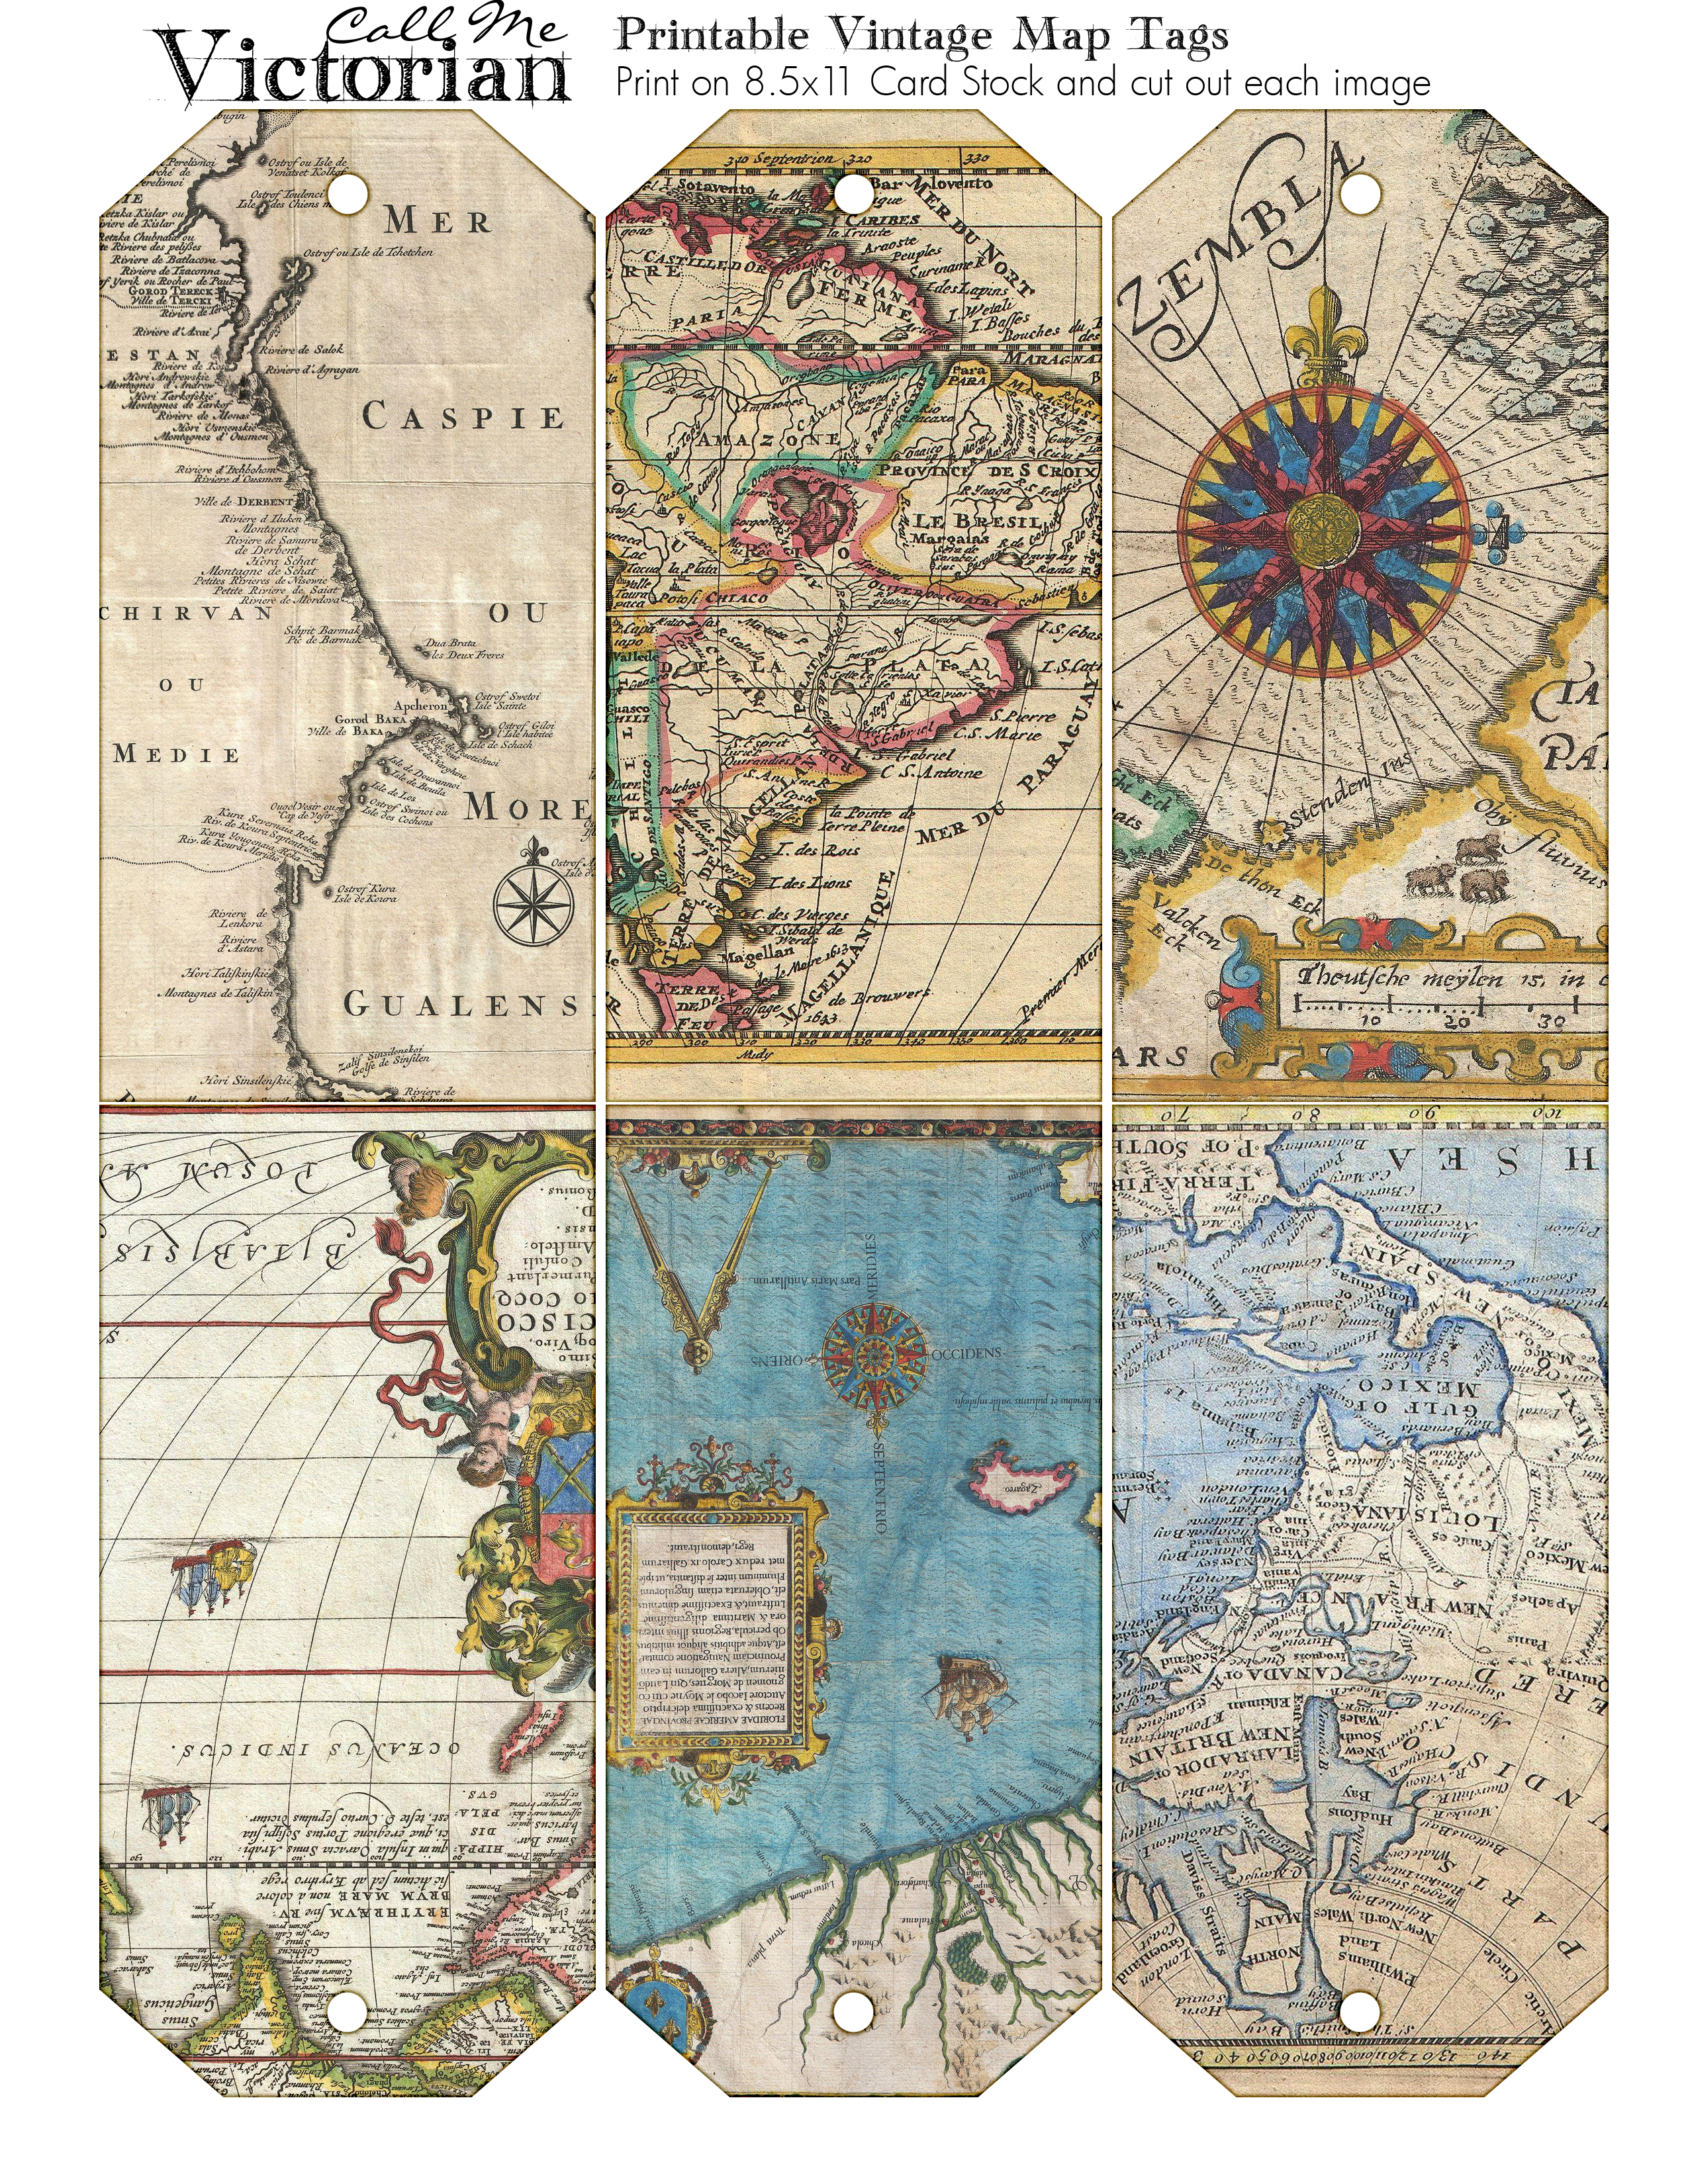 Printable Vintage Map Tags